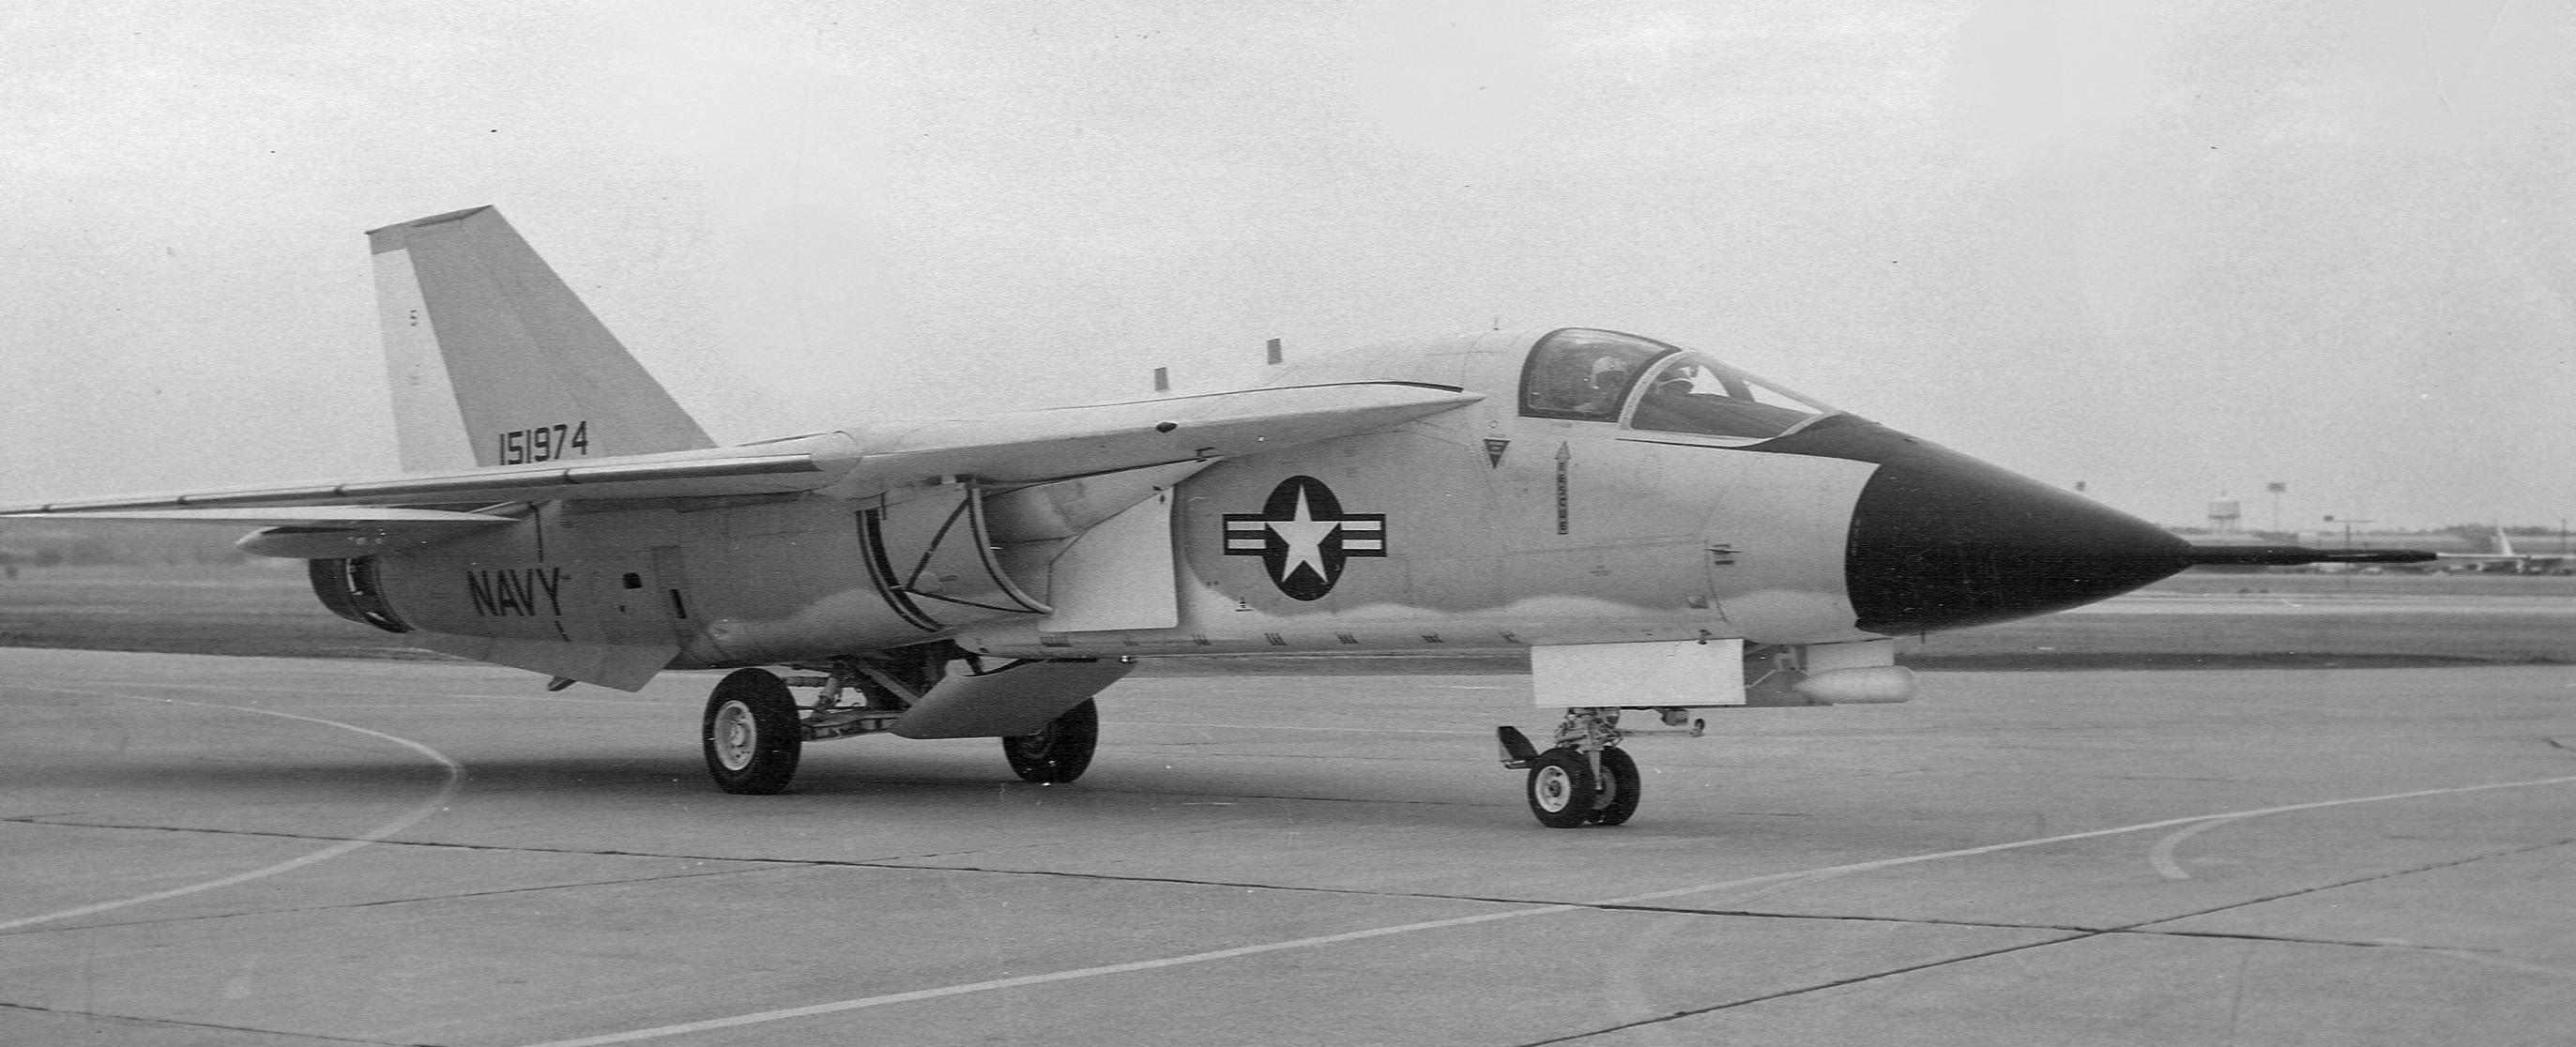 File:General Dynamics F-111B on the ground c1968.jpg - Wikimedia ...